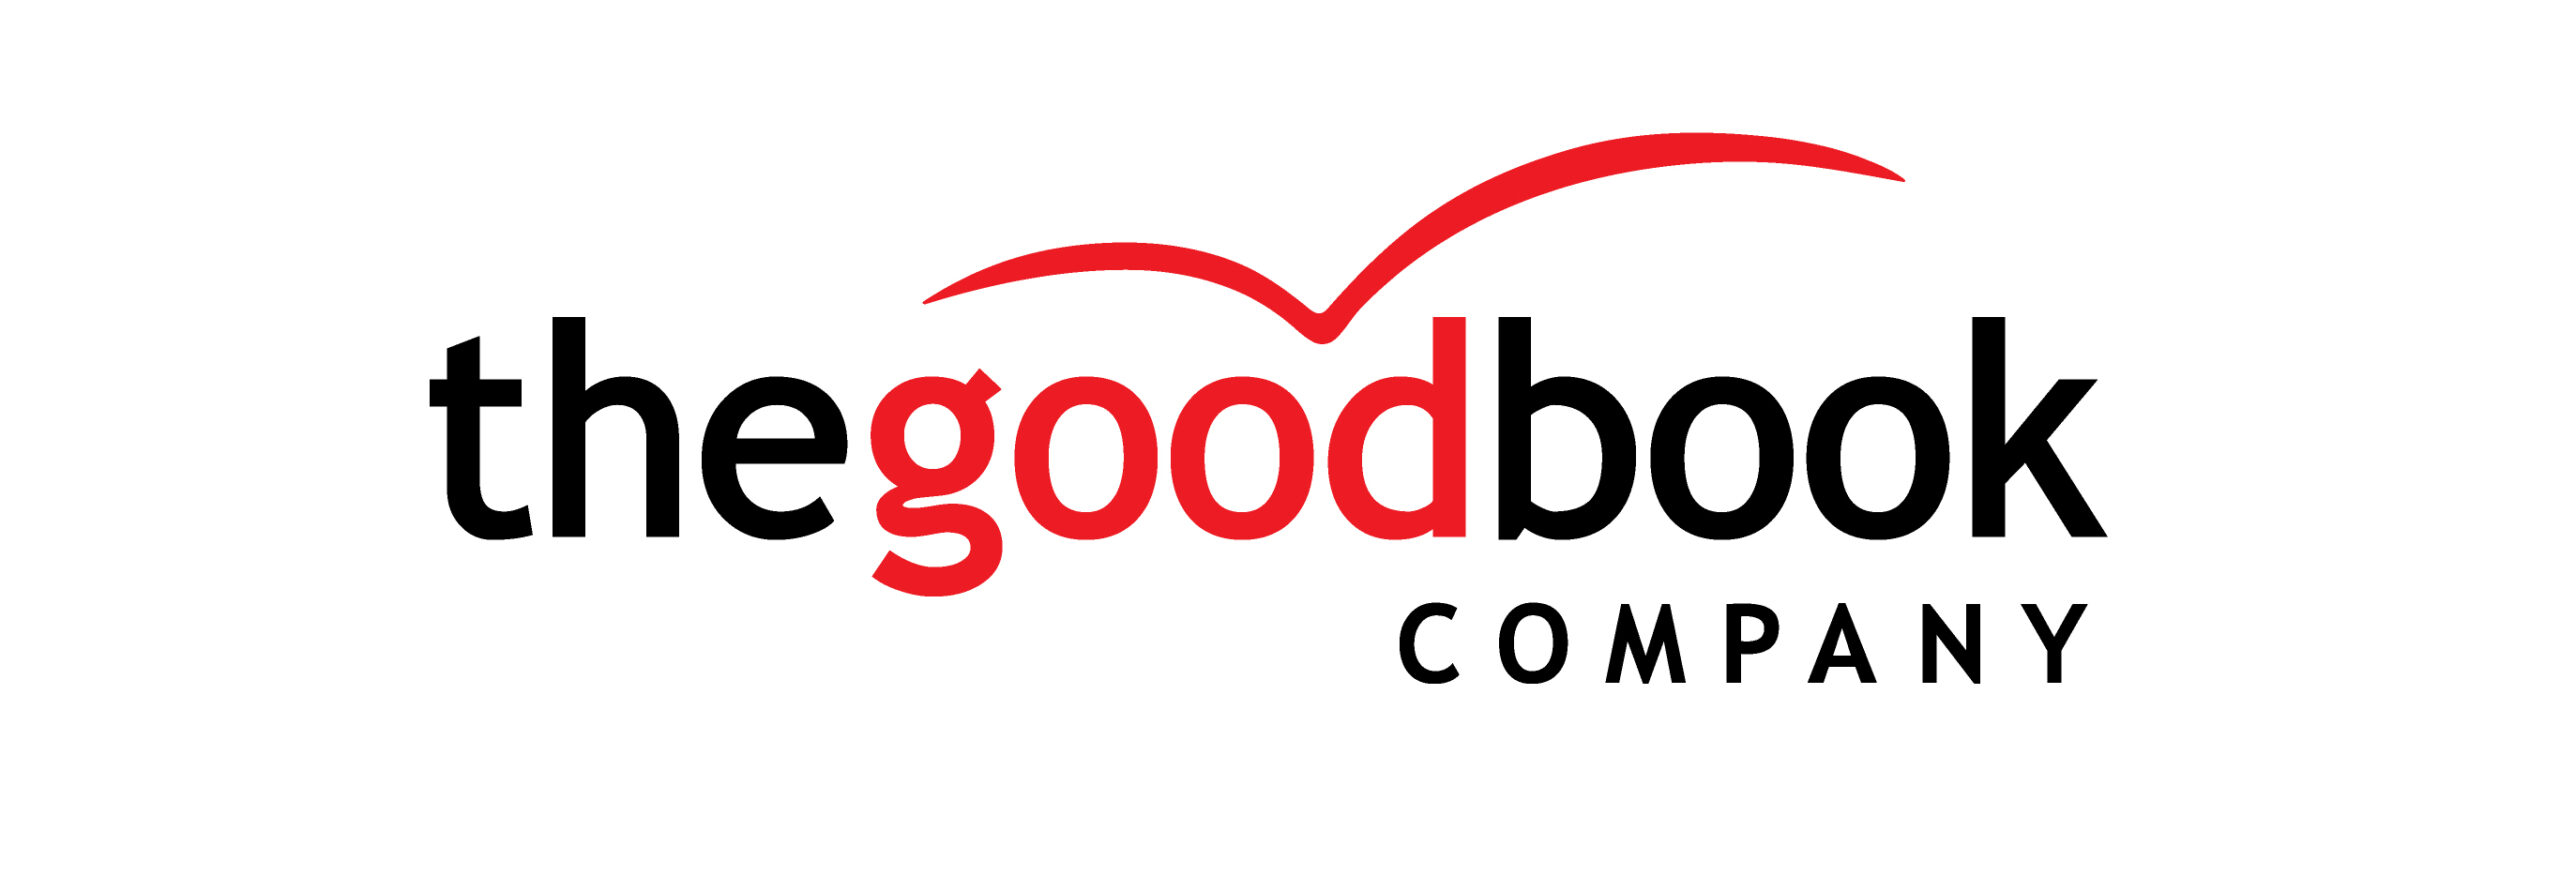 The Good Book Company